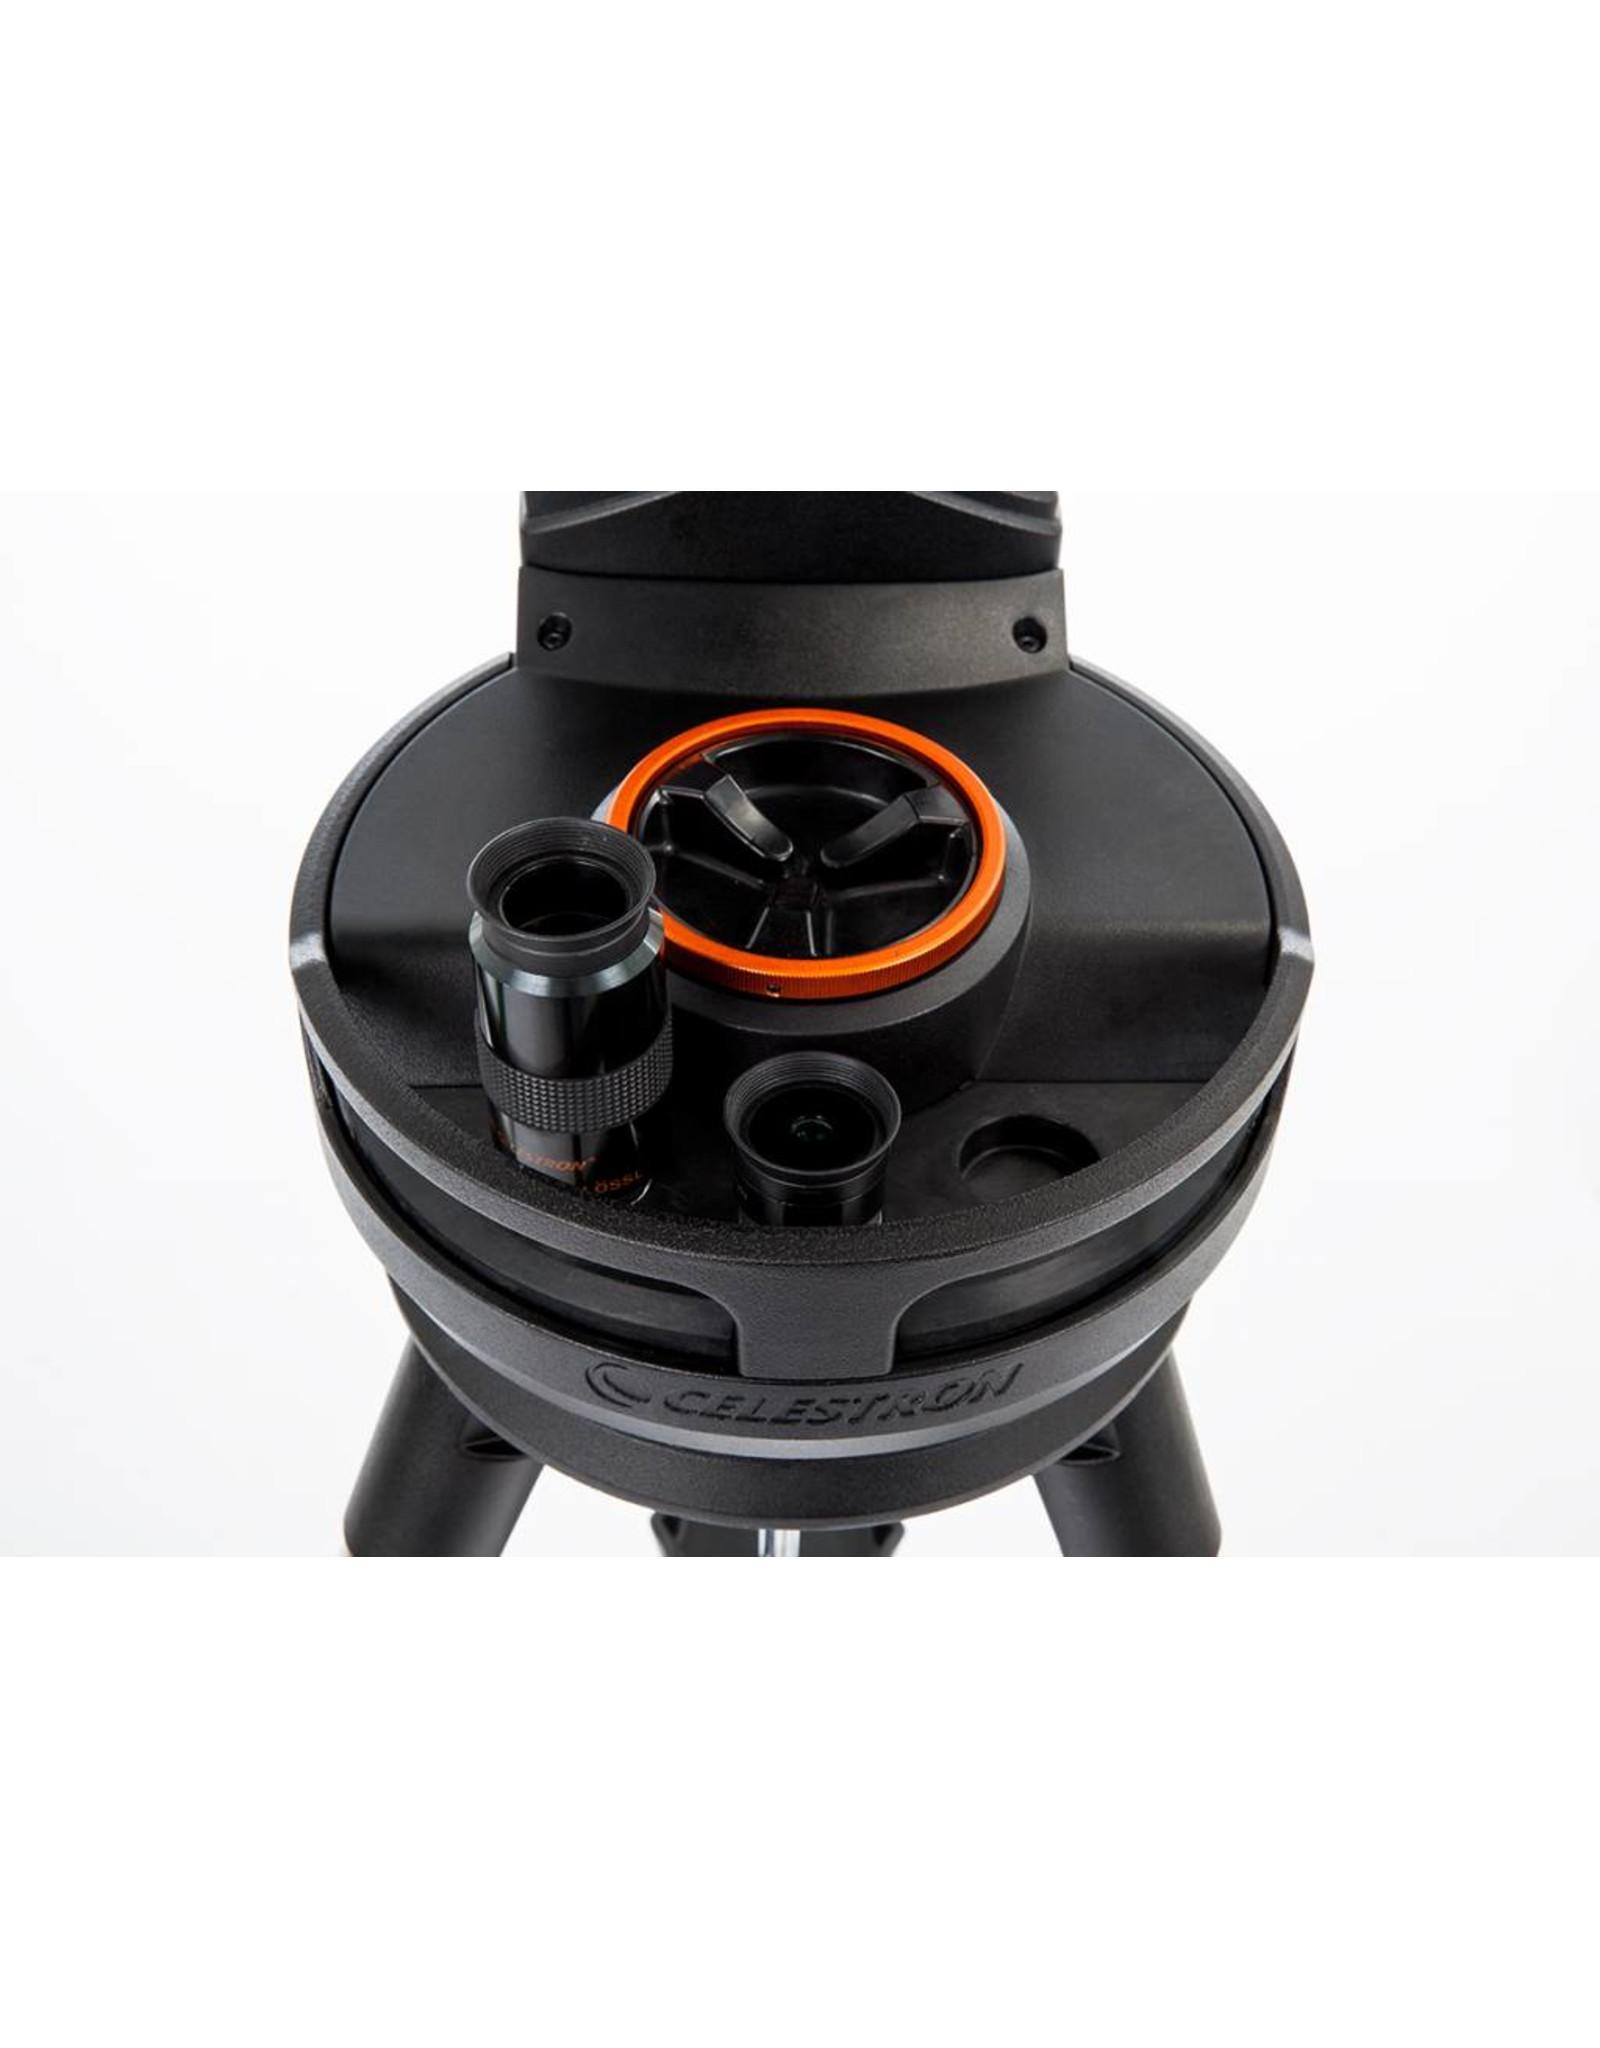 Celestron Celestron Nexstar Evolution 9.25 - Camera Concepts & Telescope  Solutions